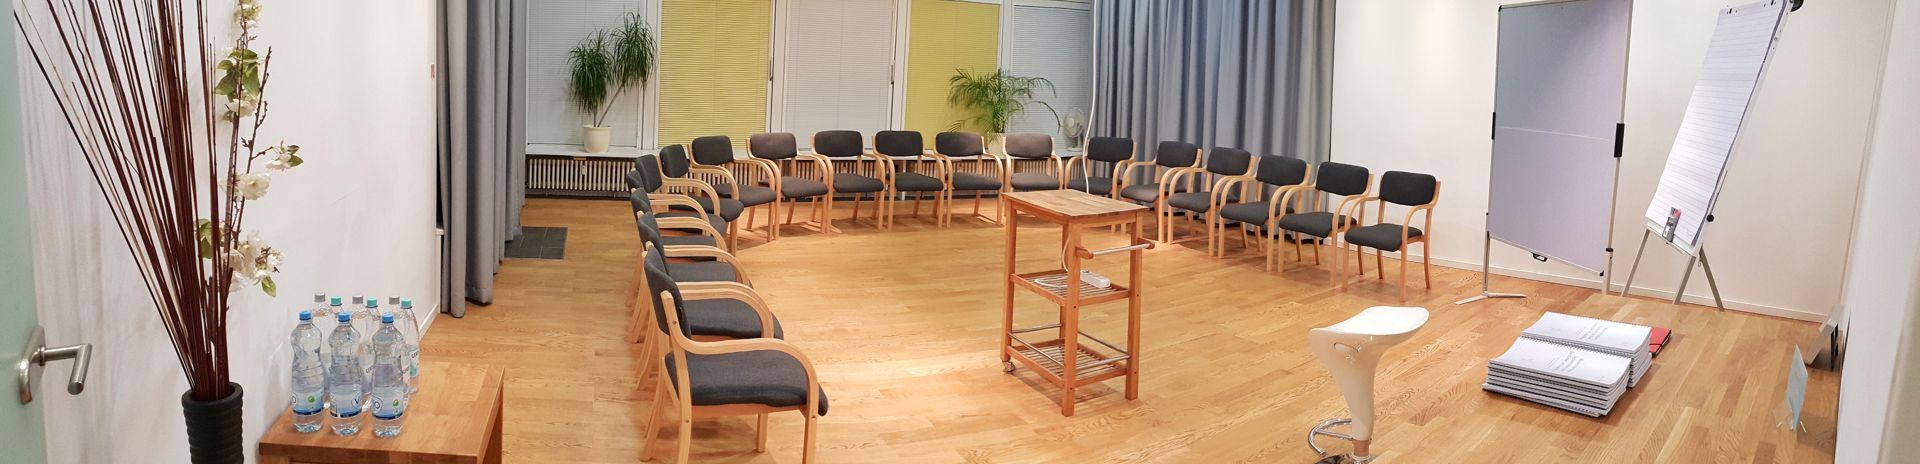 Seminar mit Stuhlkreis & Beamer